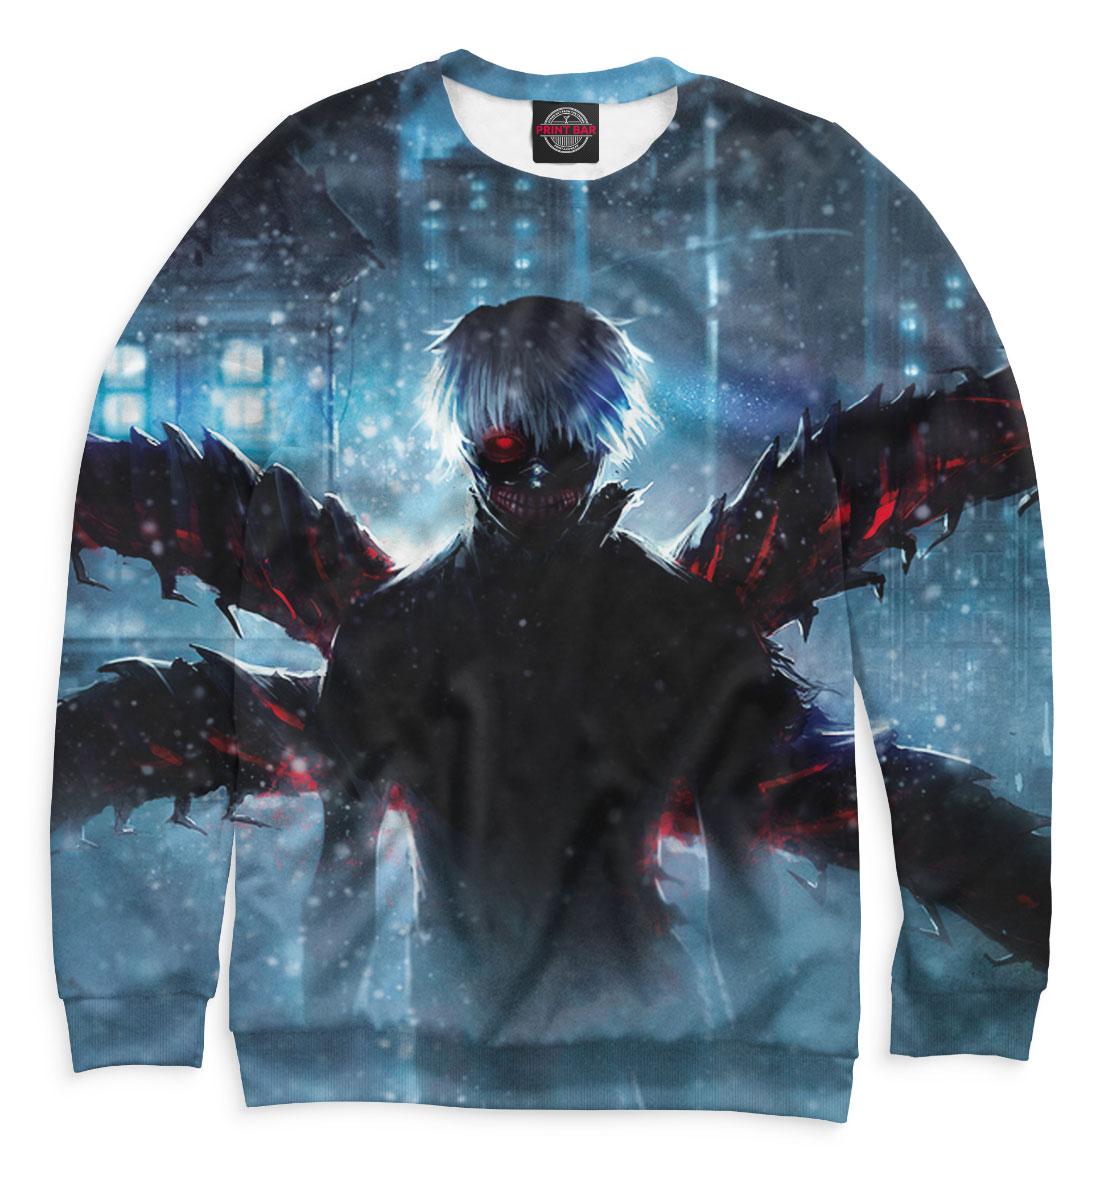 Купить Tokyo Ghoul, Printbar, Свитшоты, TKG-501396-swi-1